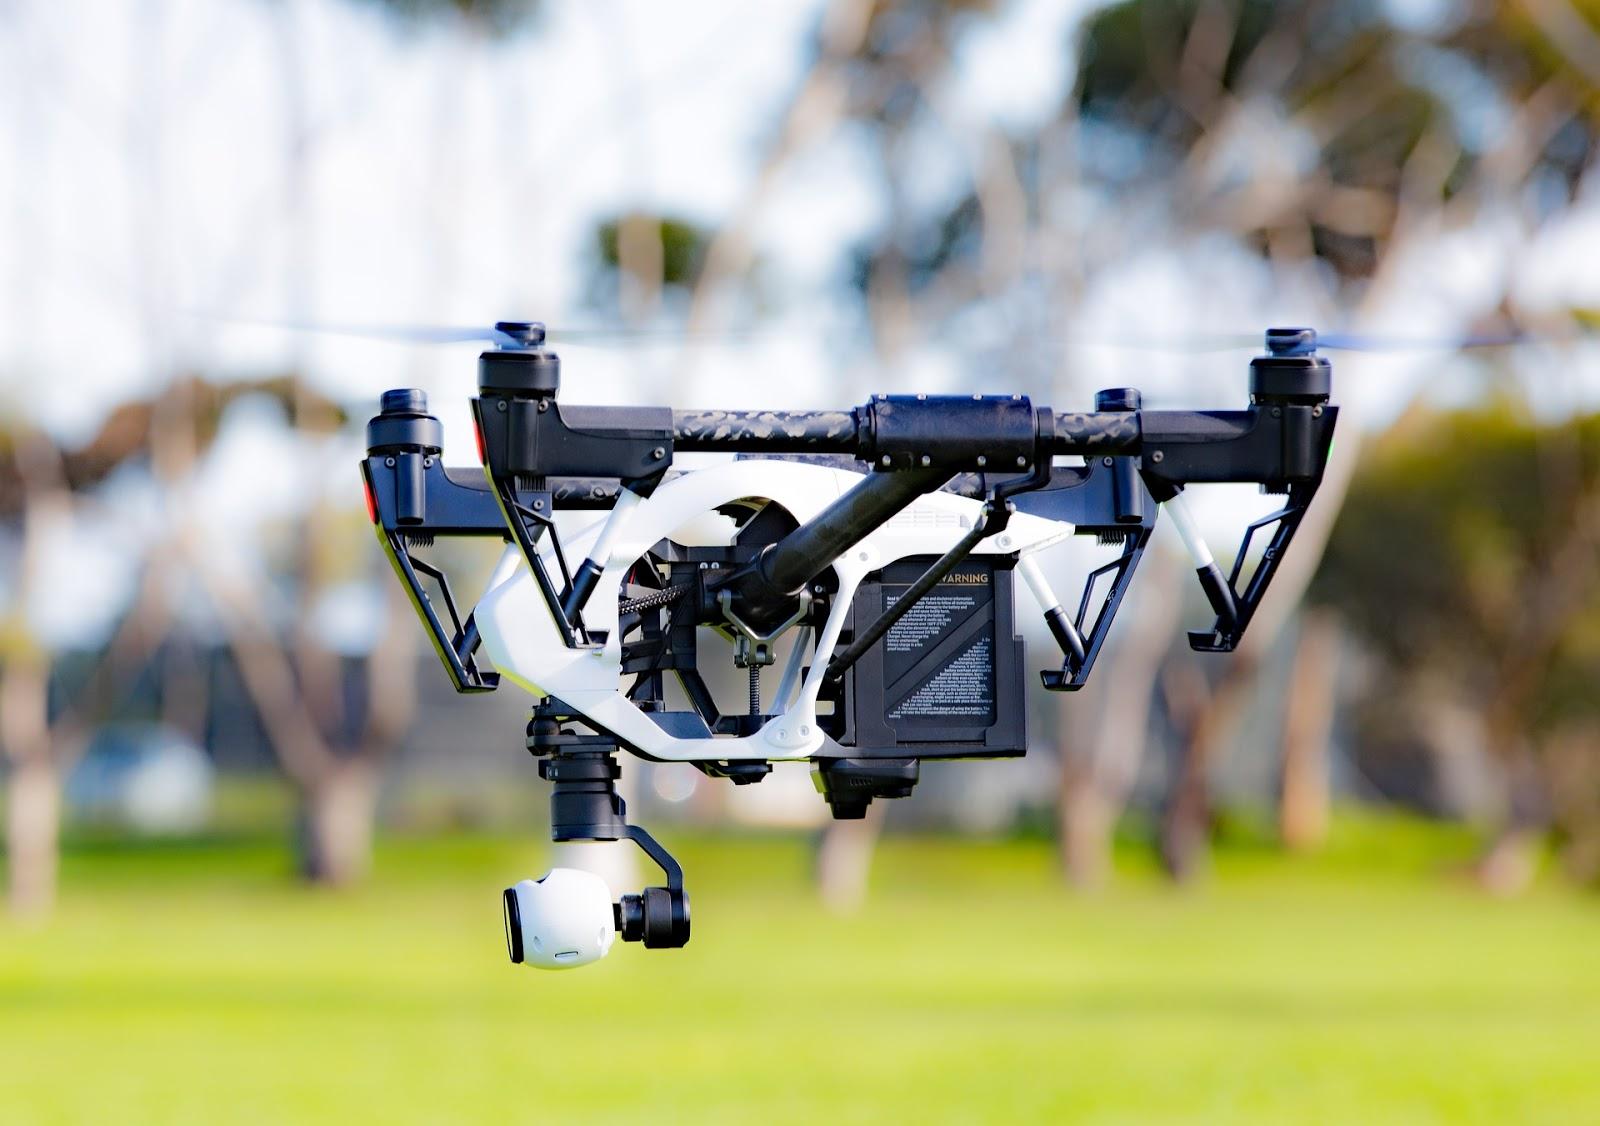 Israel loves drones